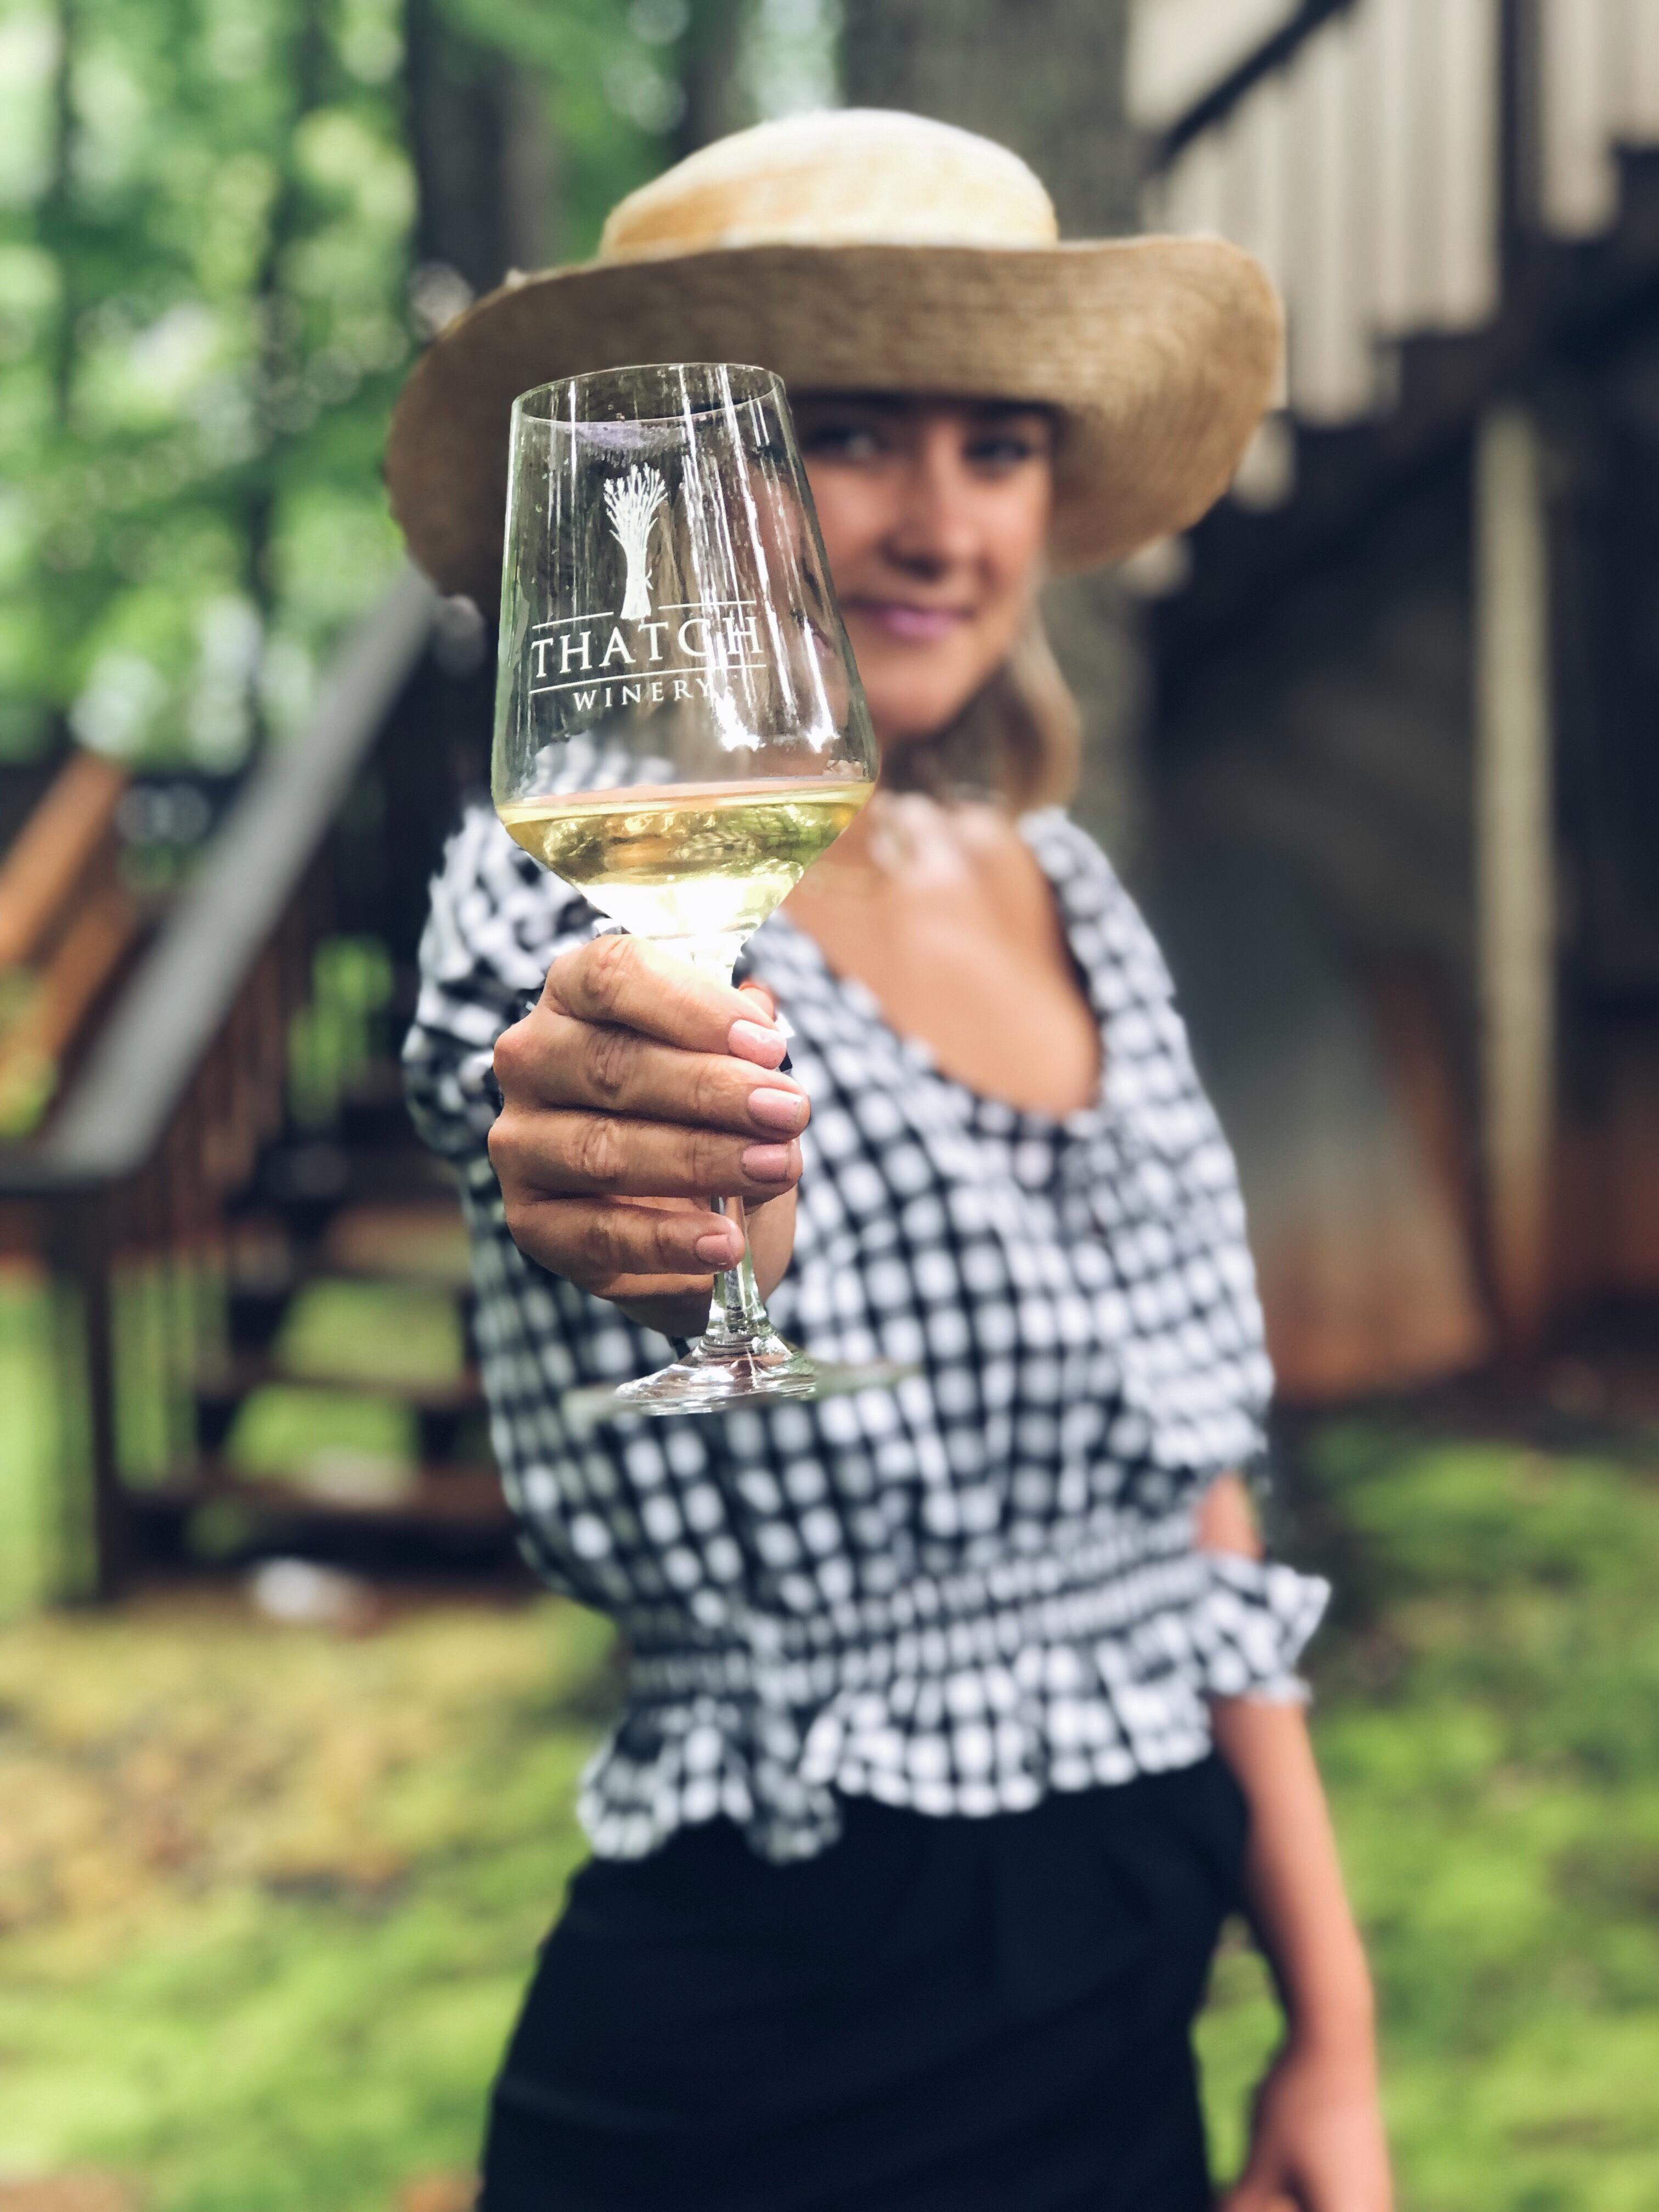 thatch winery charlottesville virginia